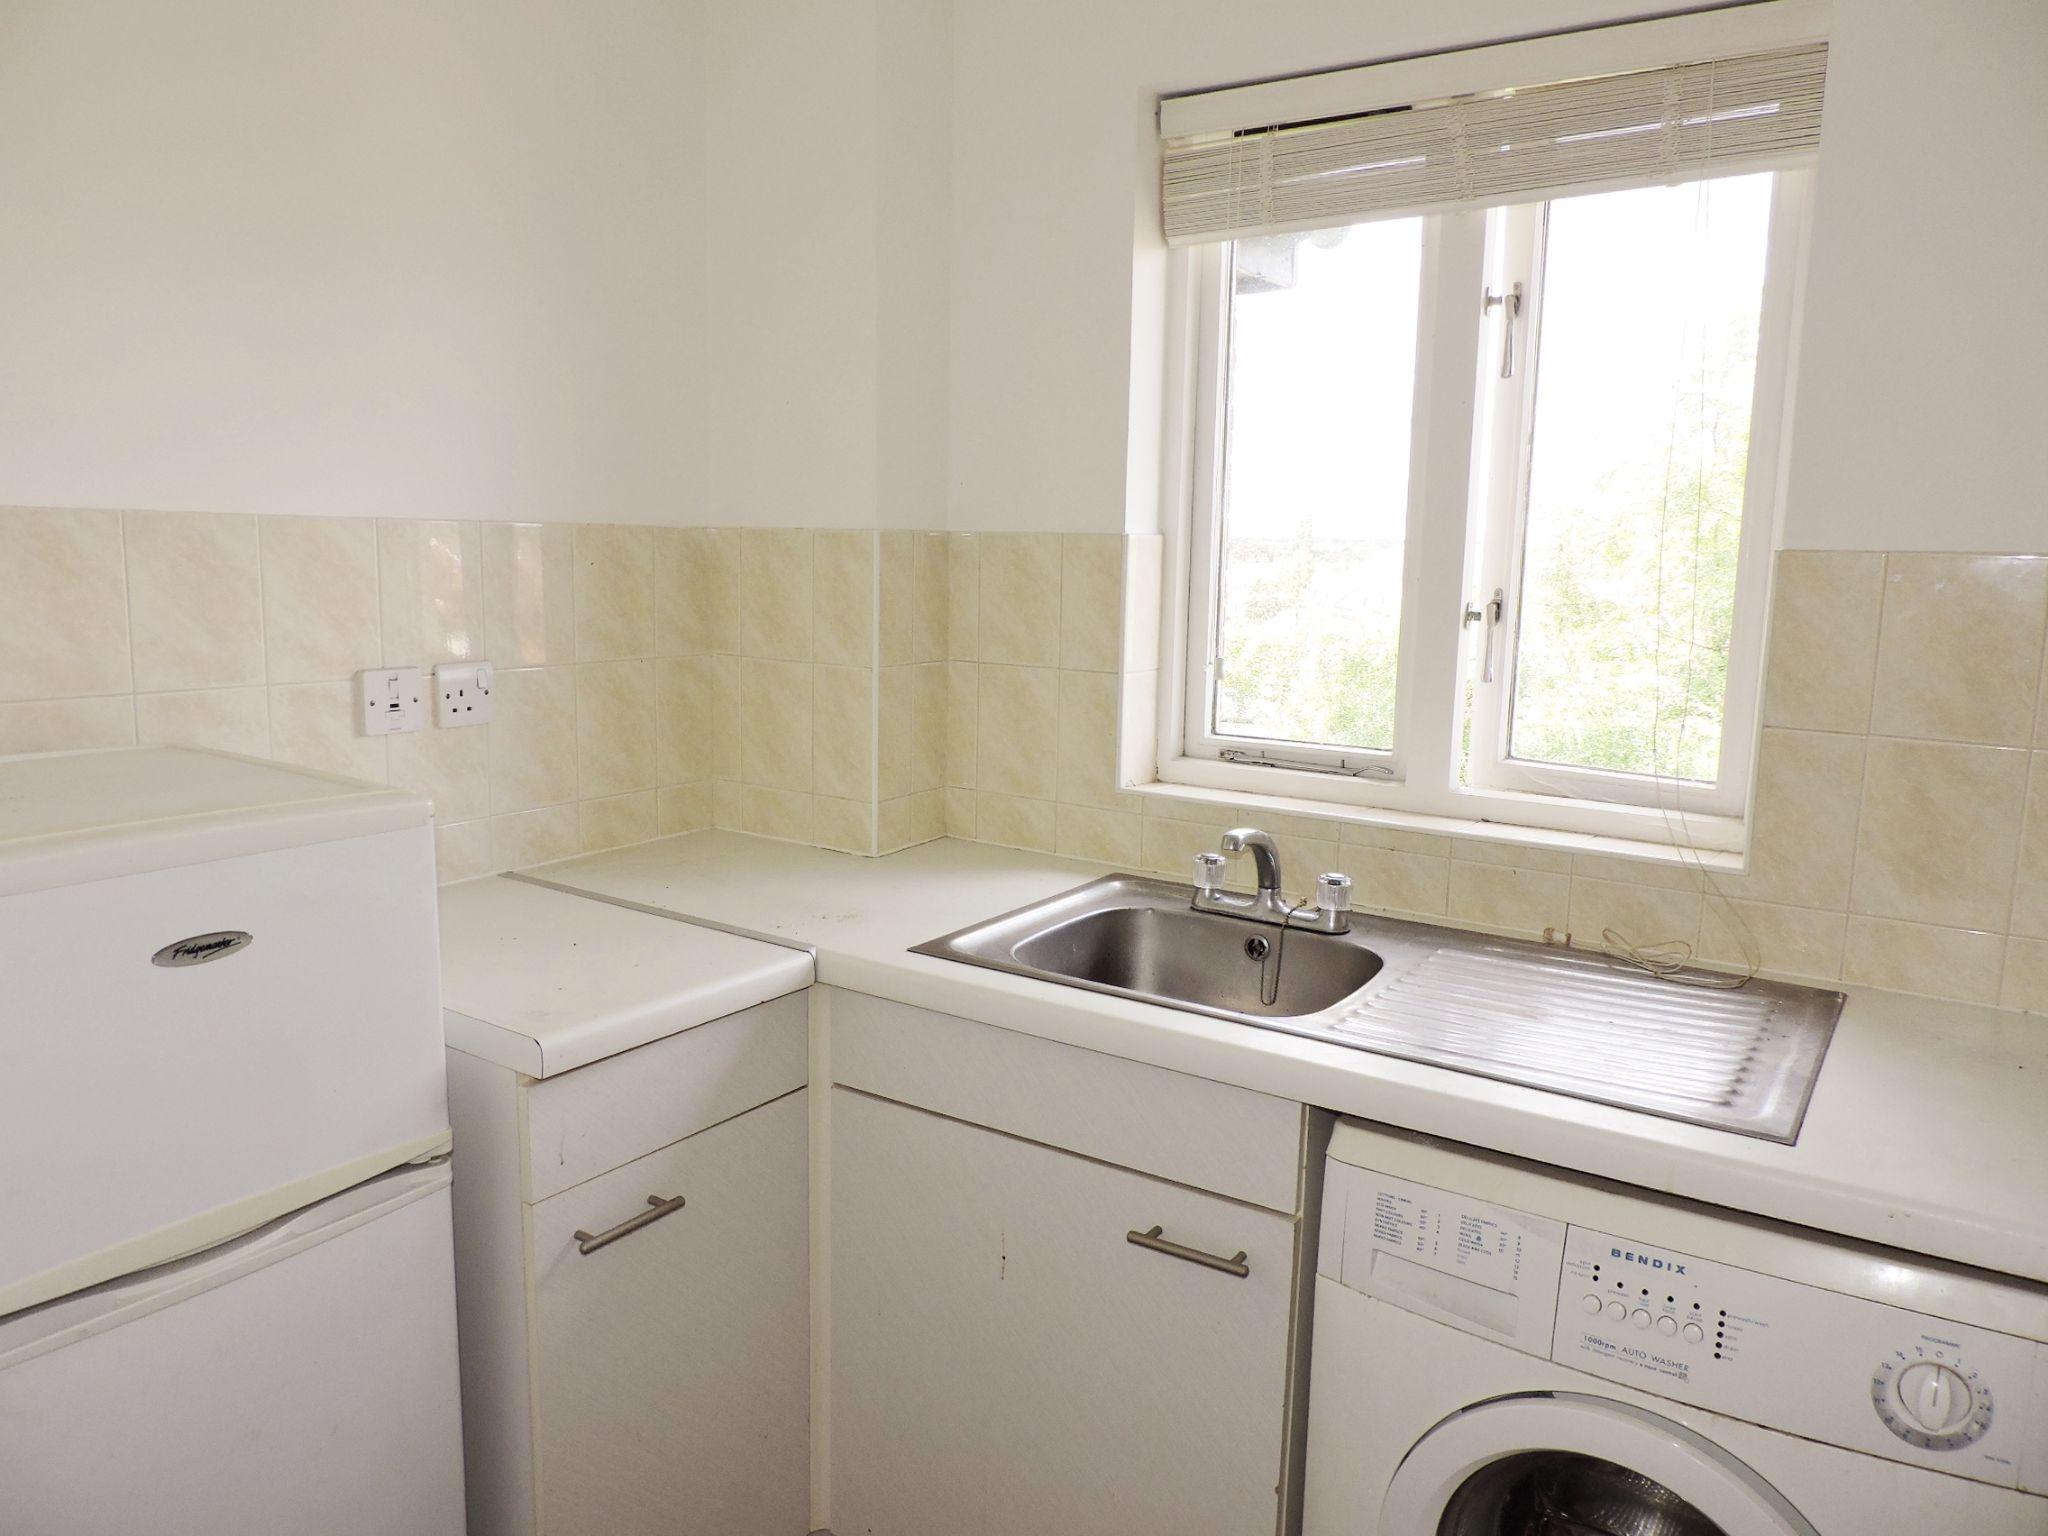 apartment flat/apartment Let in Worcester Park - Photograph 6